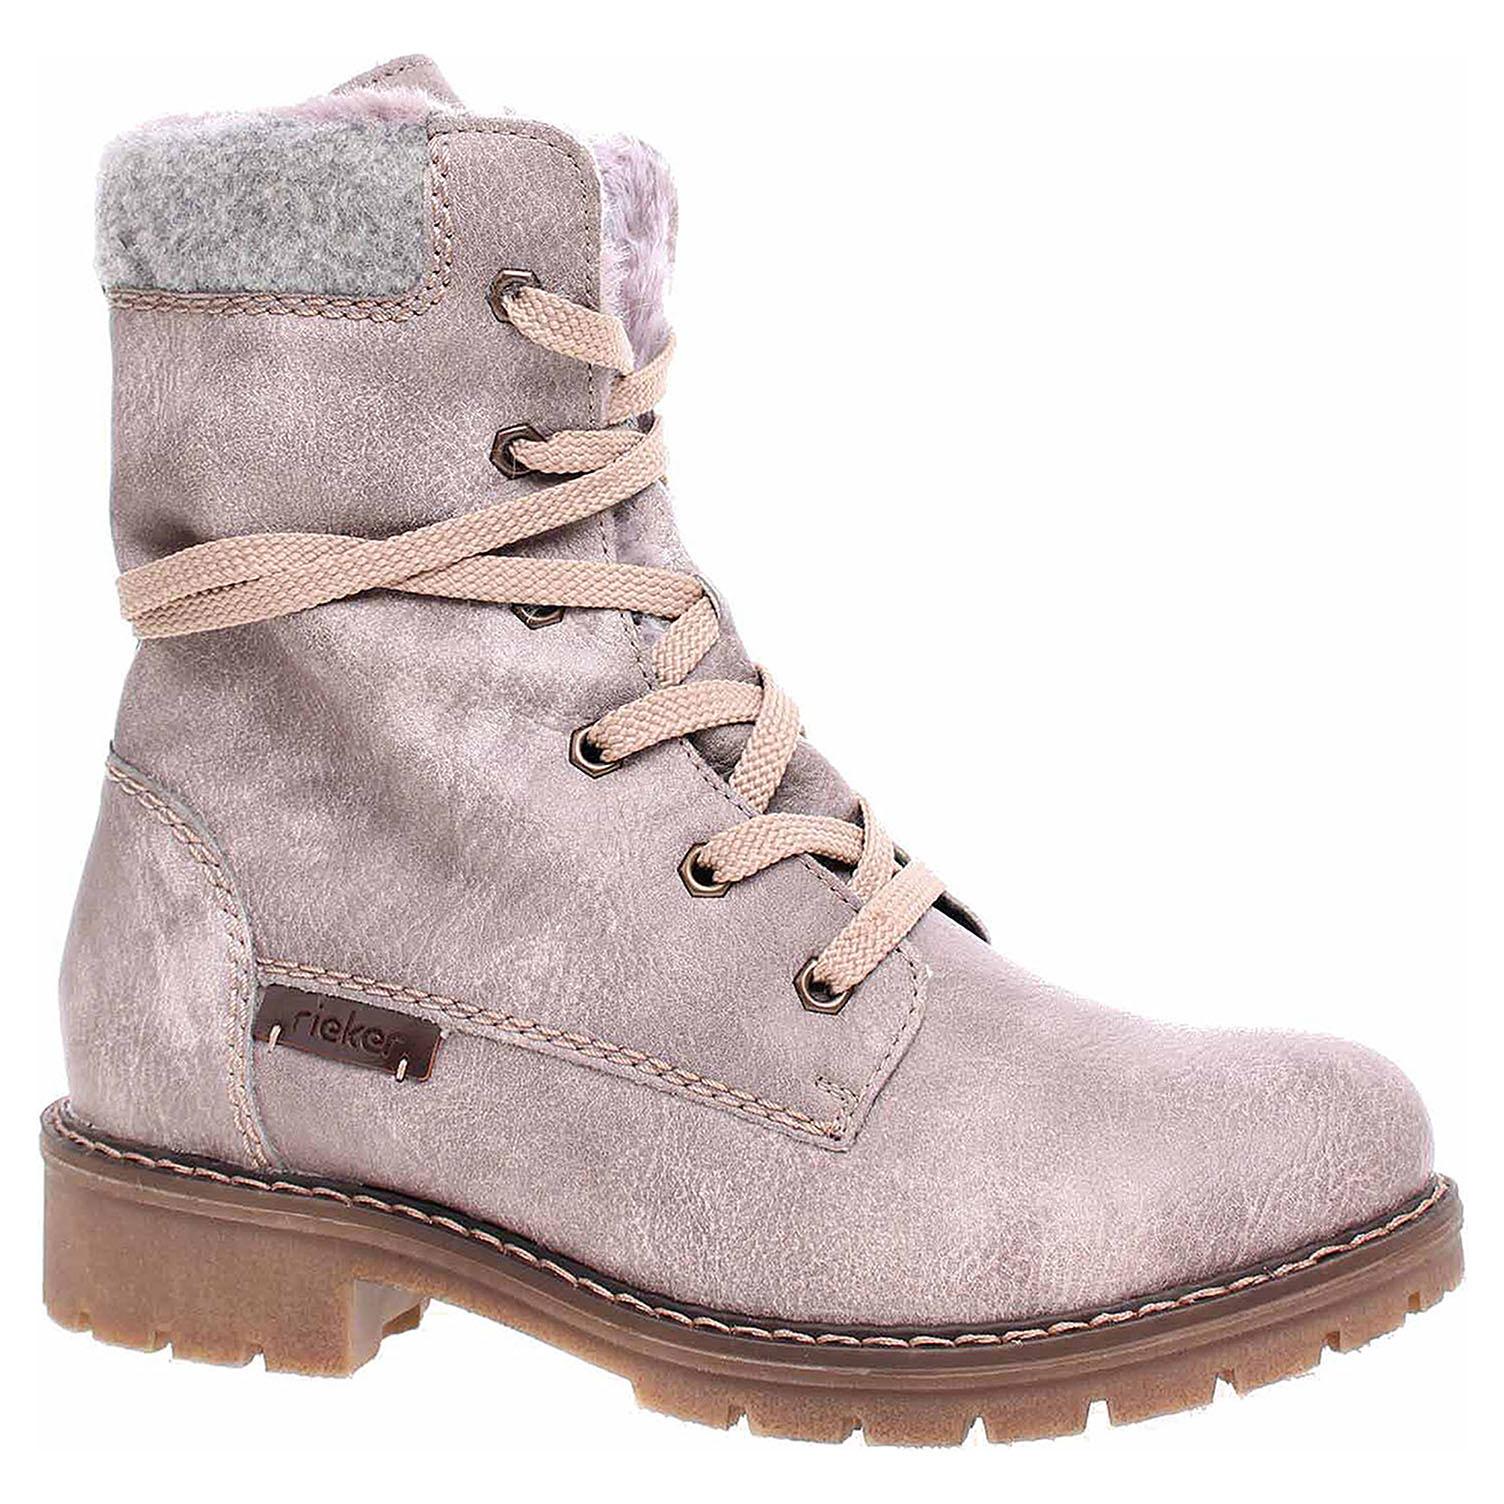 Dámská kotníková obuv Rieker Y9122-42 grau kombi Y9122-42 38